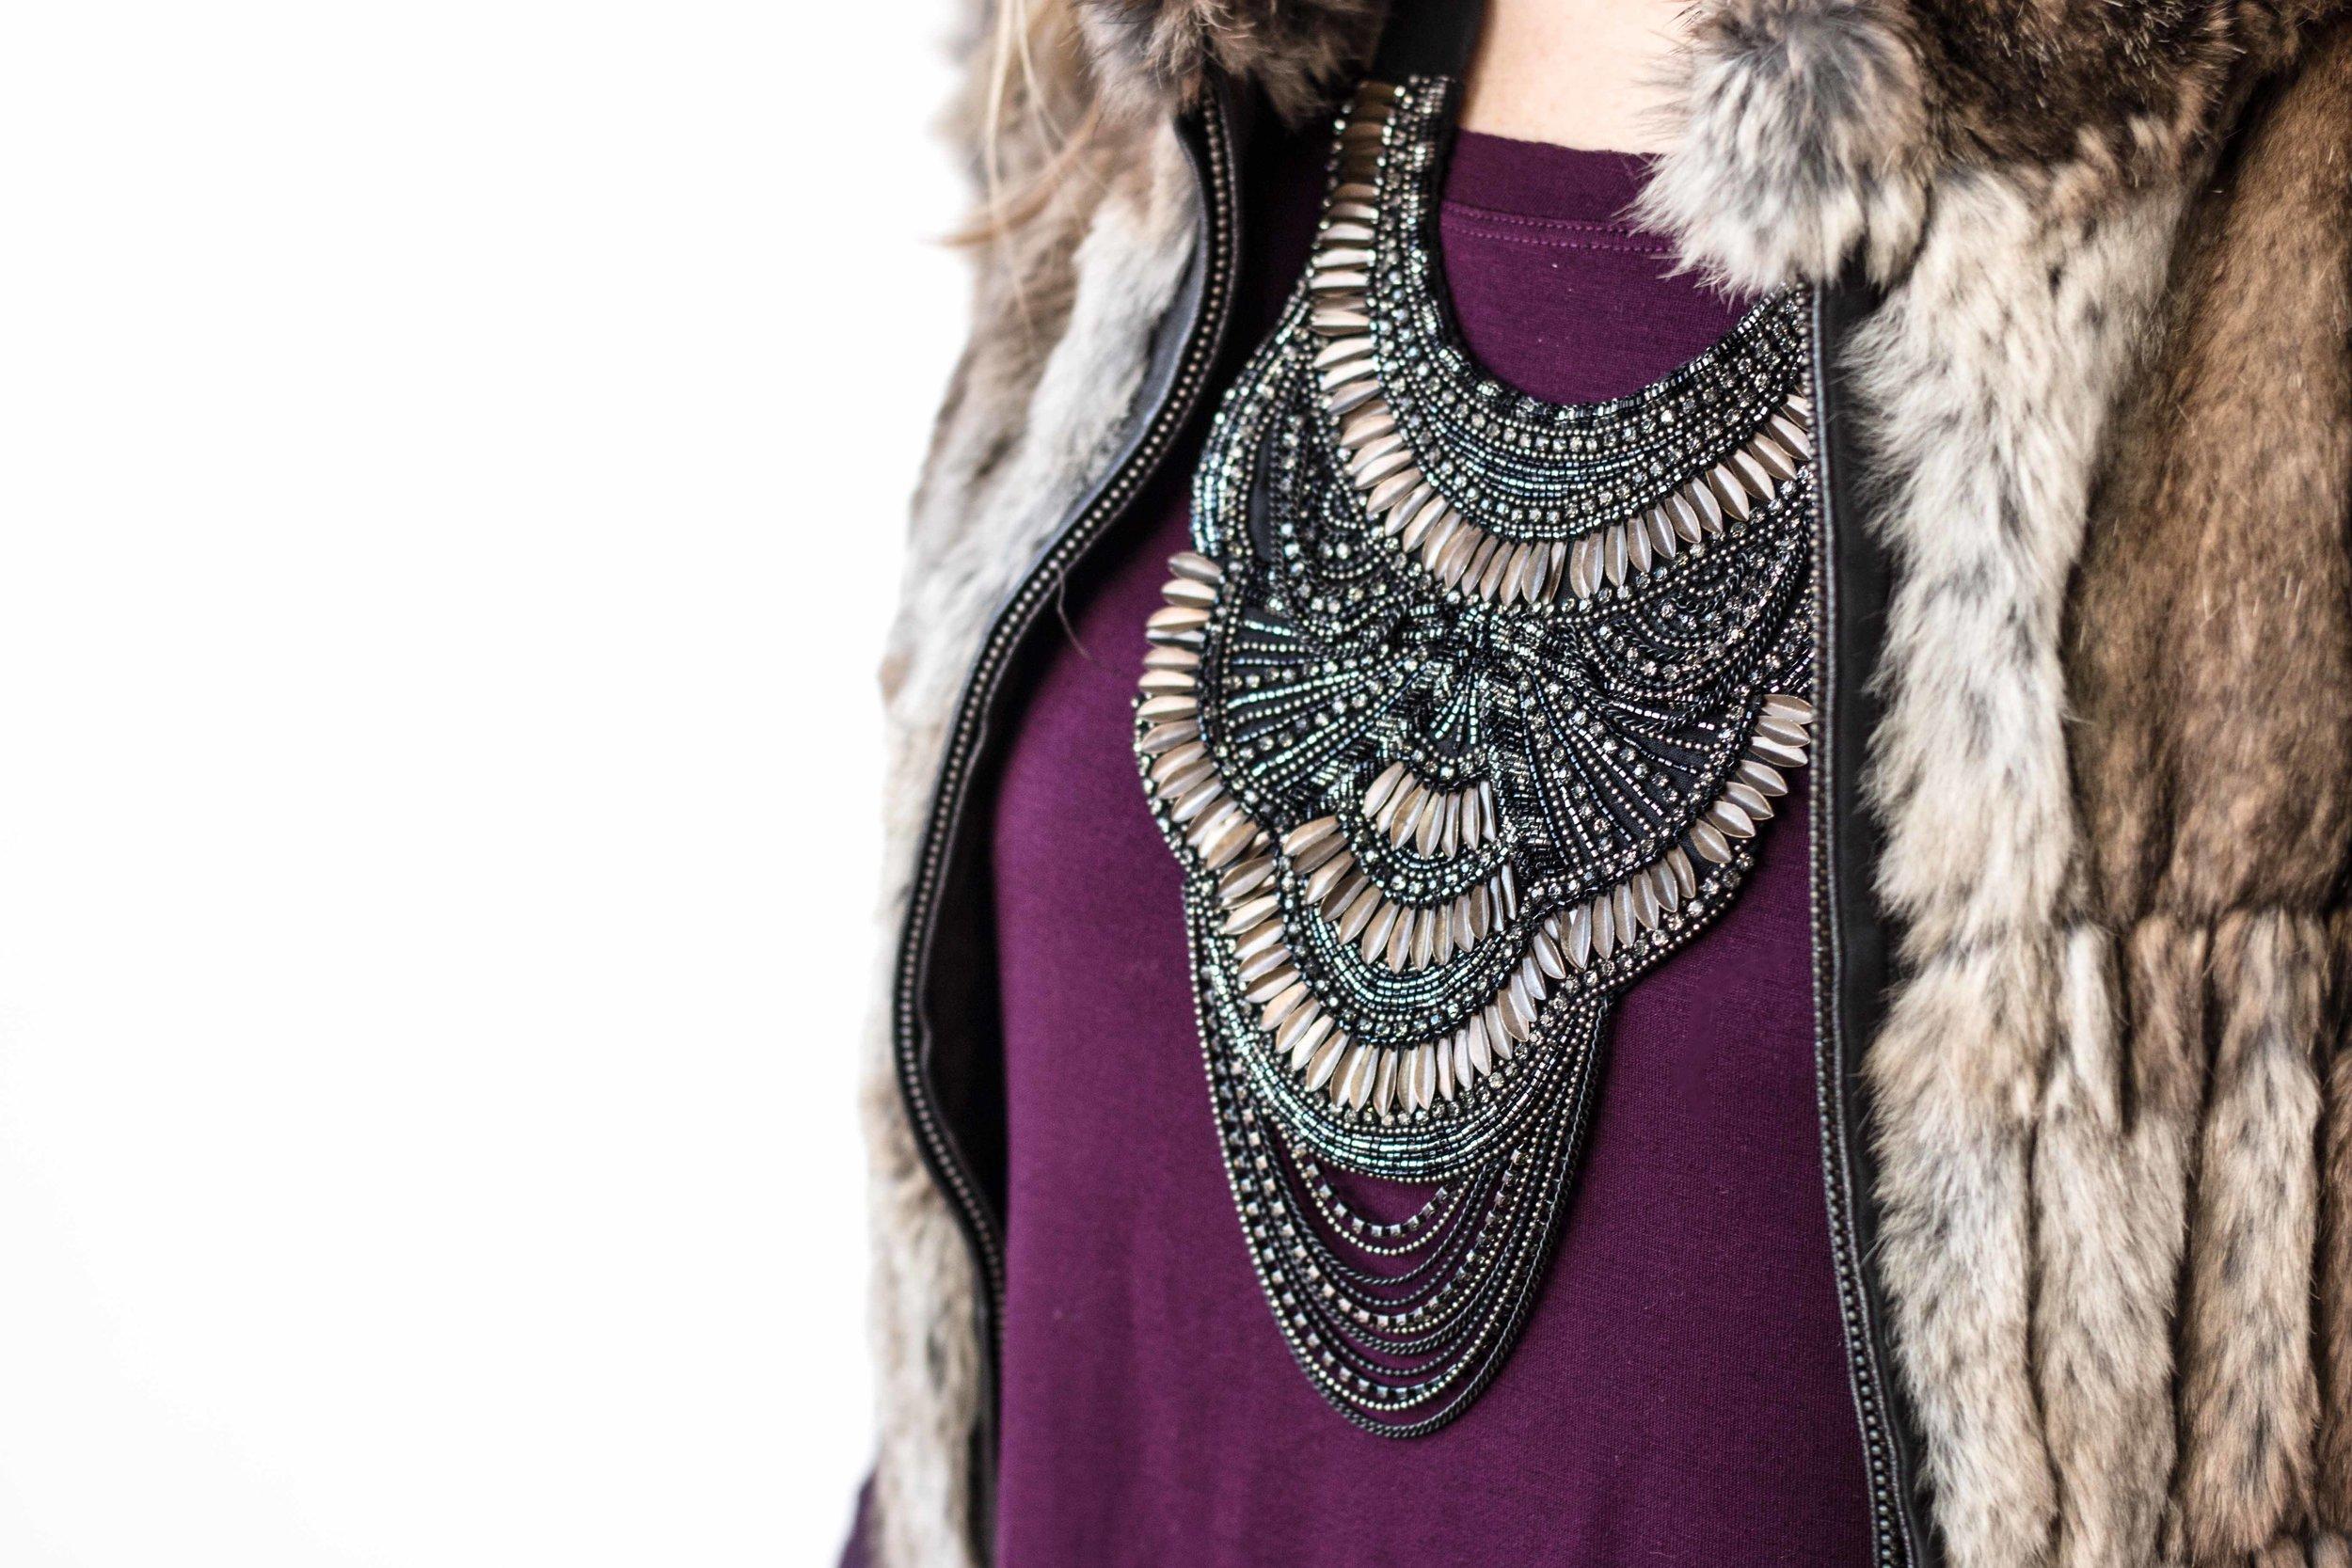 favorite necklace